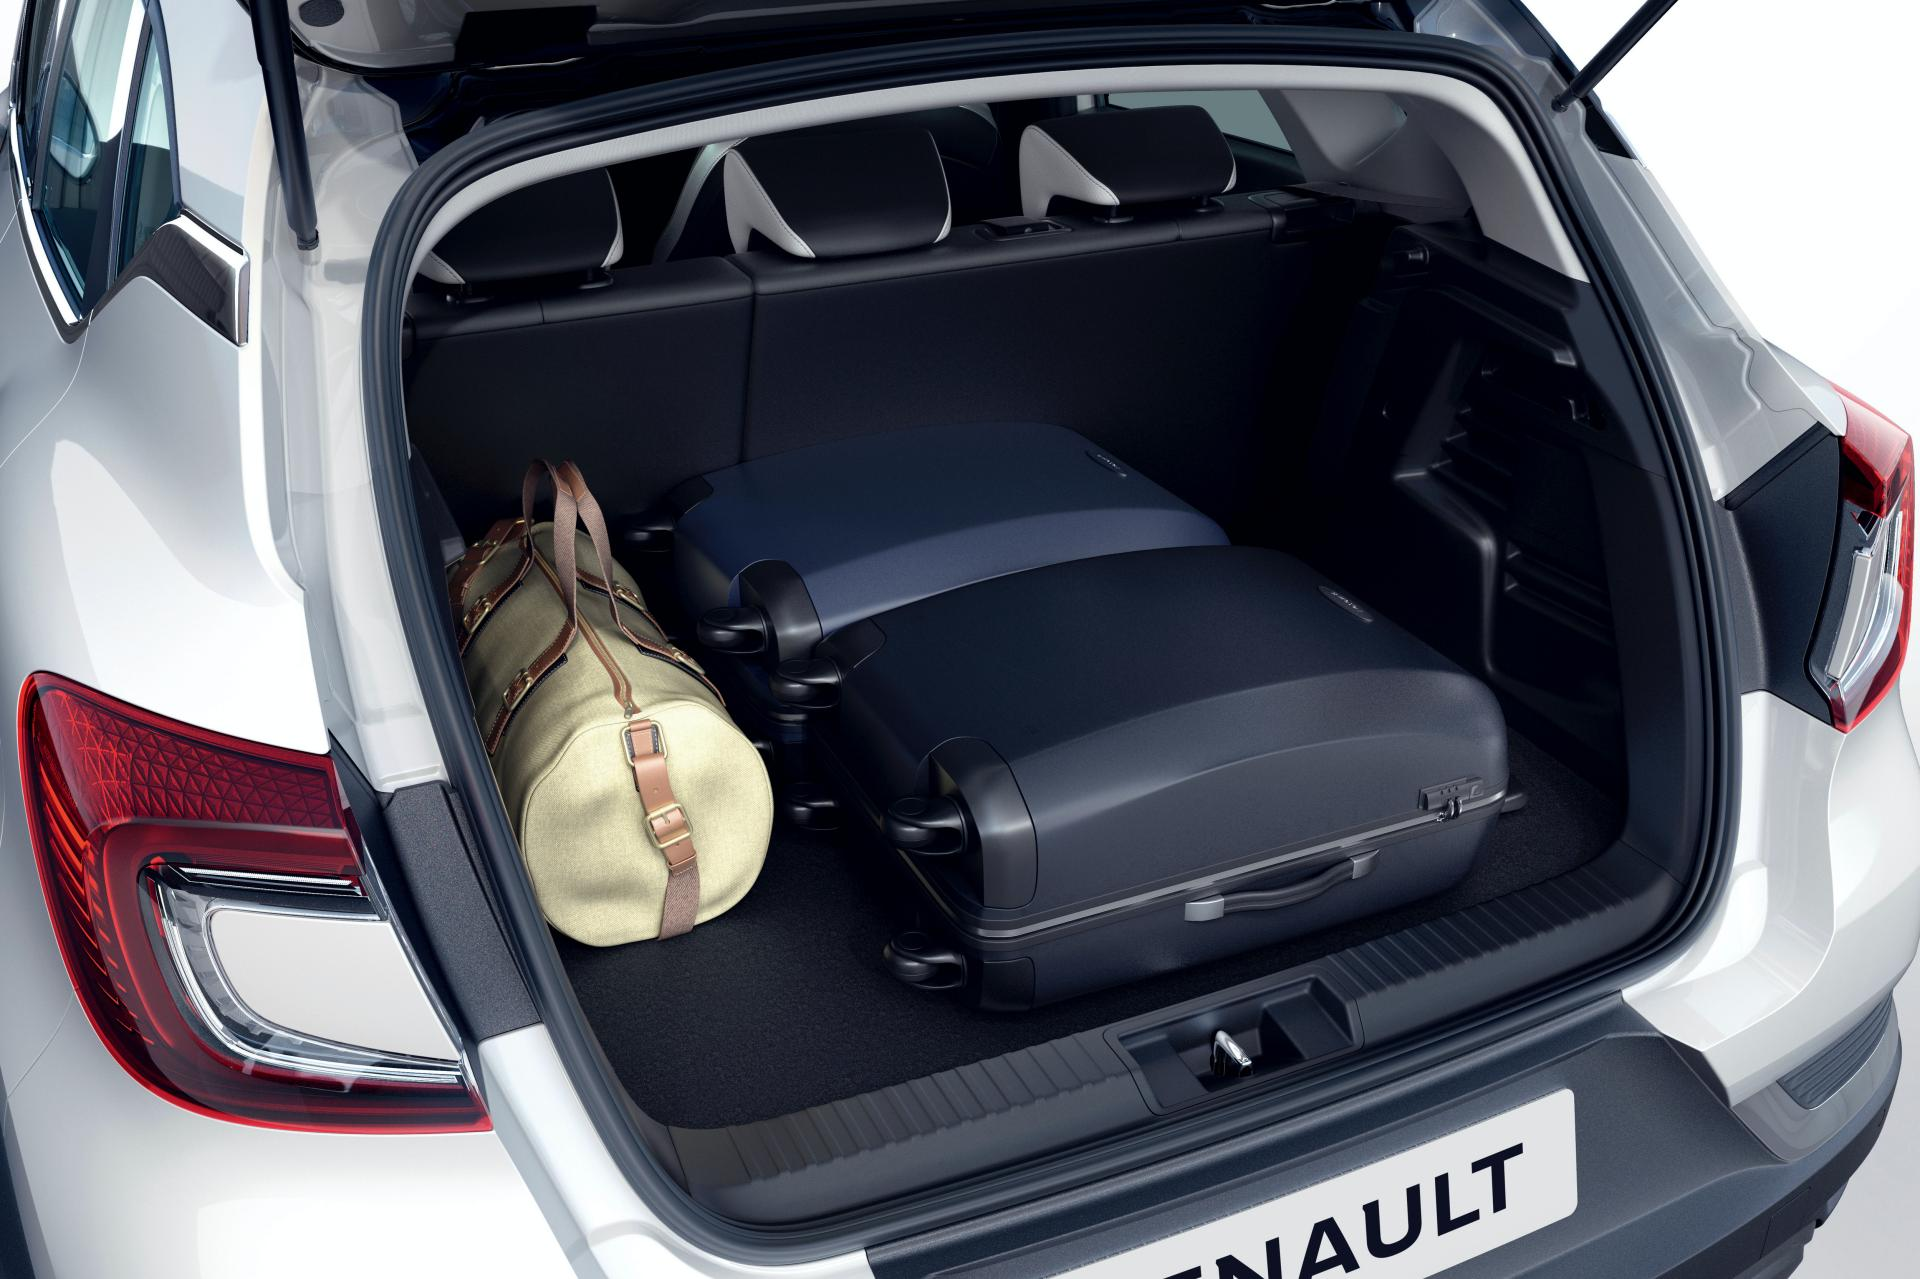 2020-Renault-Captur-E-Tech-plug-in-hybrid-3